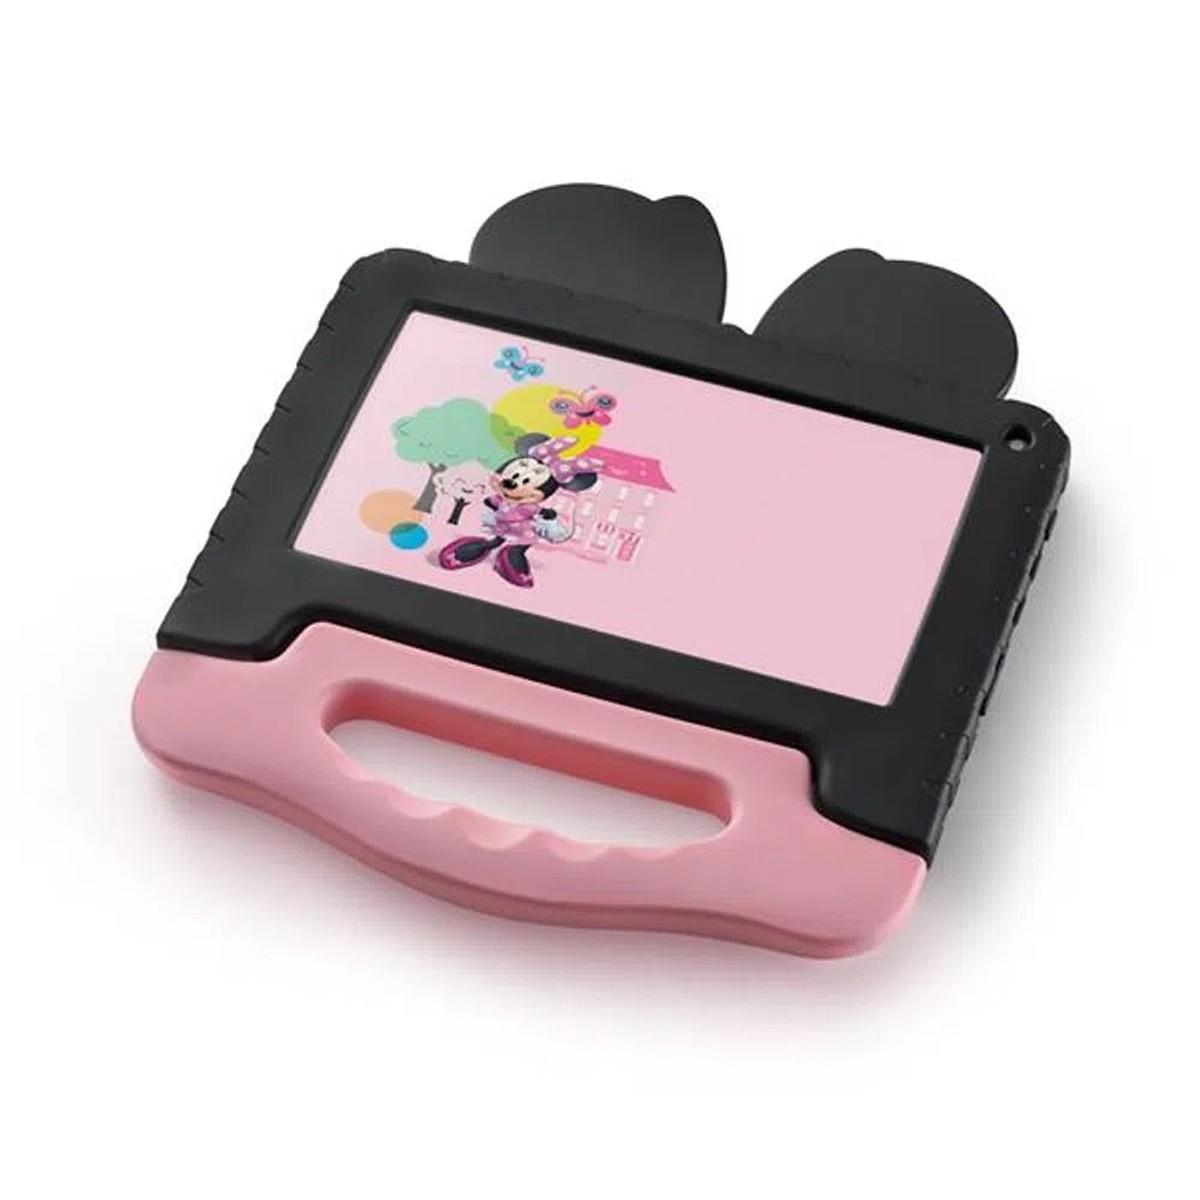 Tablet Infantil Multilaser Nb340 16gb Tela 7' Wifi Minnie